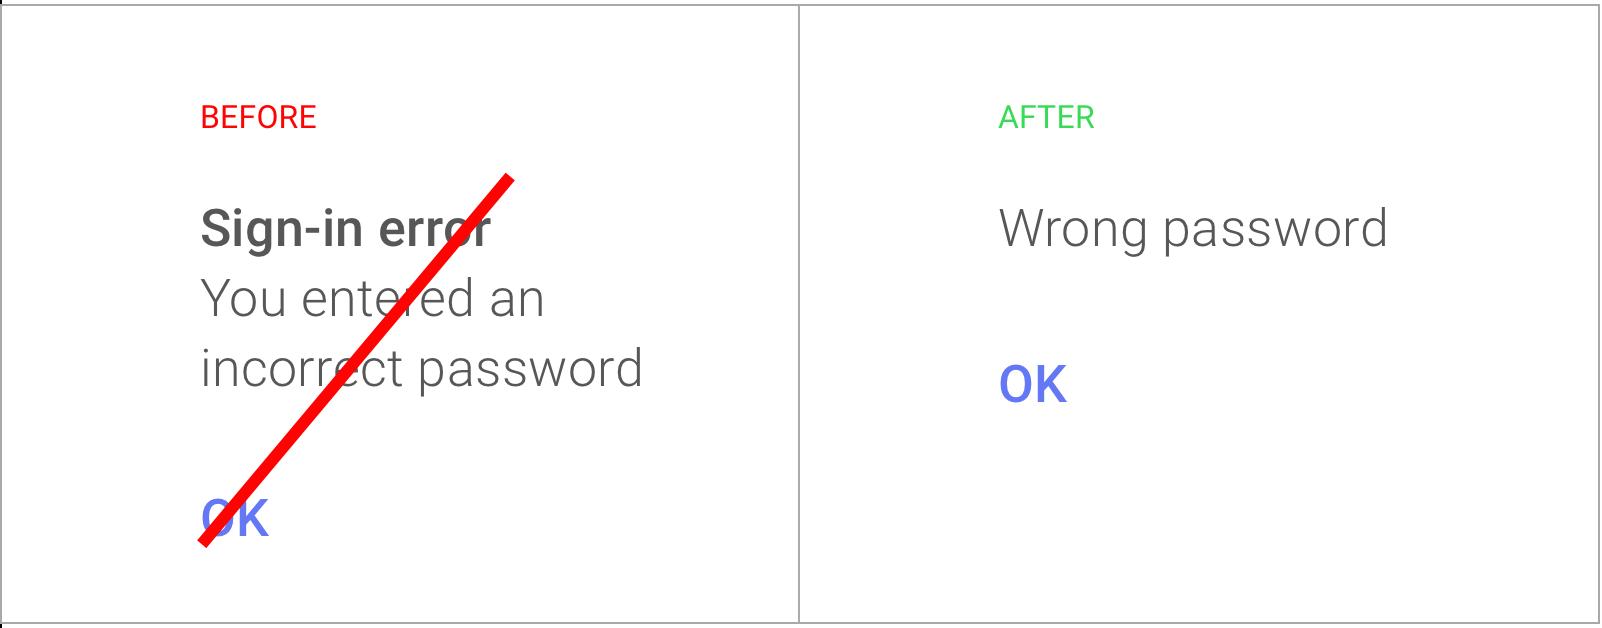 Google frontloading UX copy